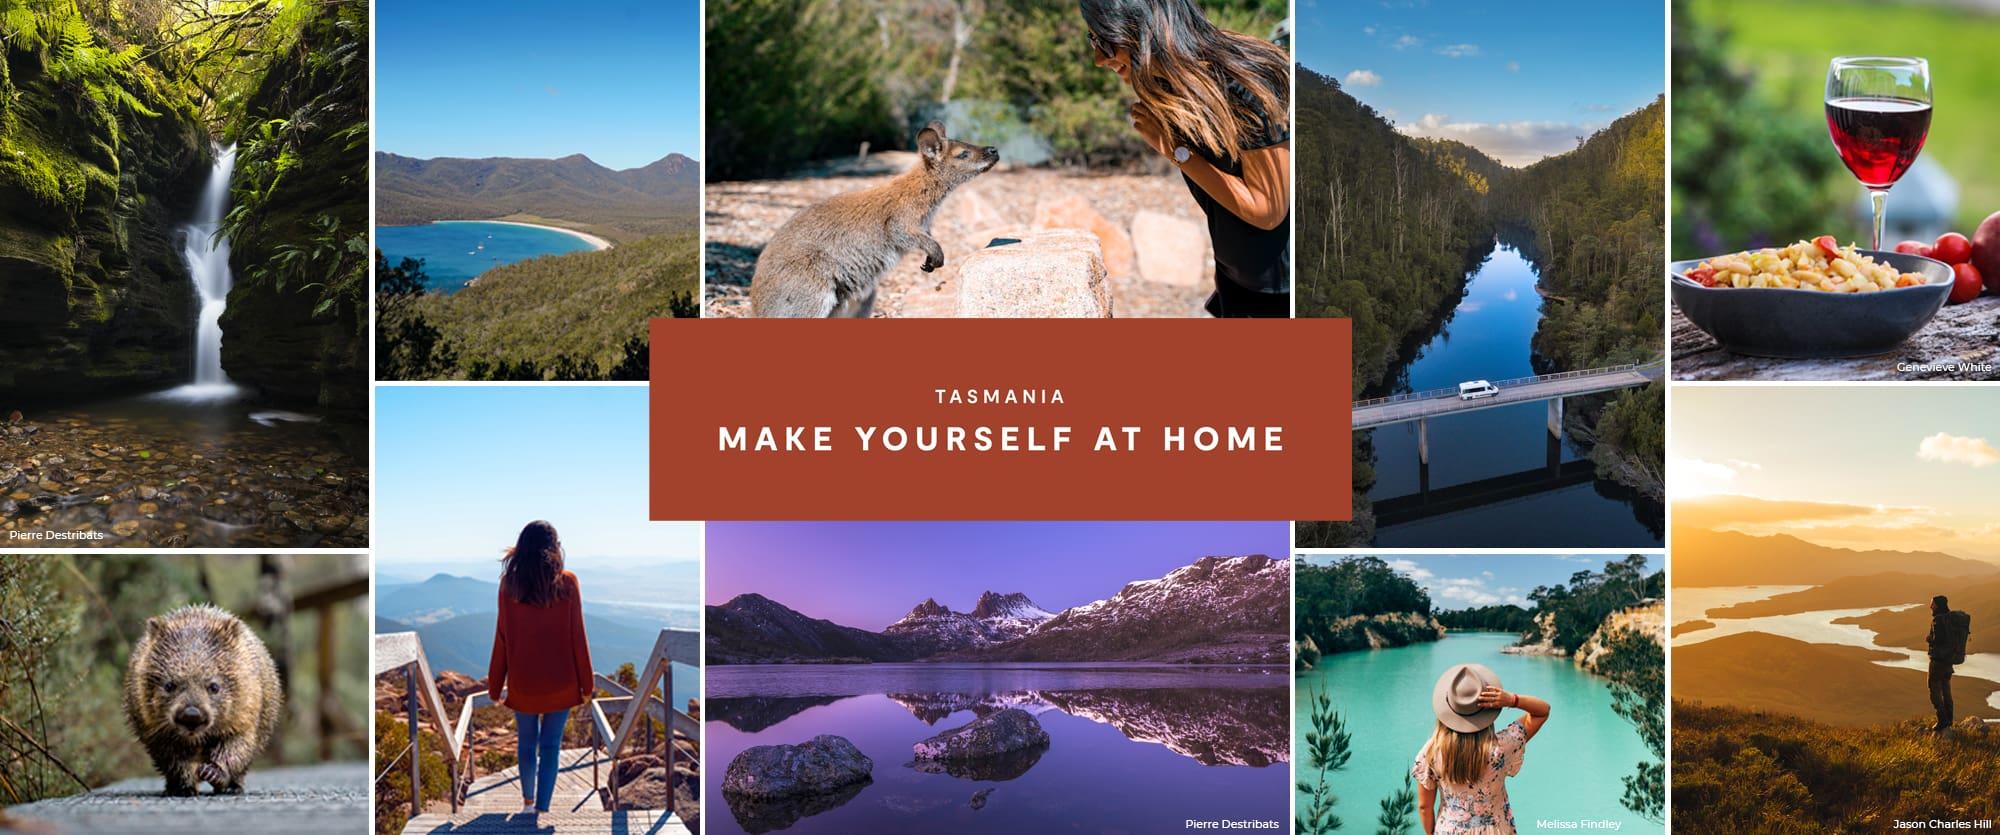 tasmania make yourself at home